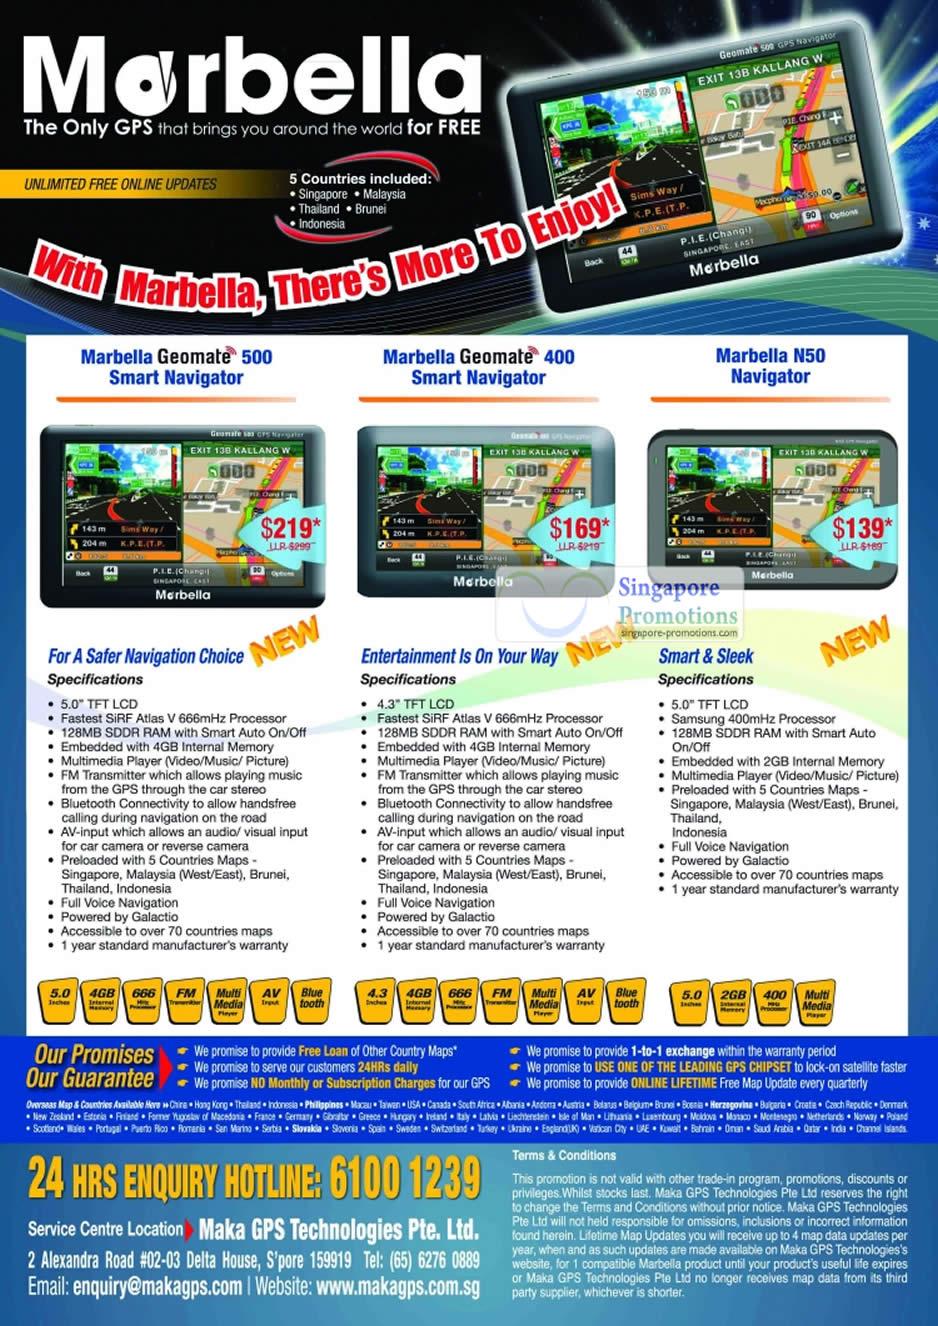 2 Aug Marbella Geomate 500n Geomate 400, N50 Navigator